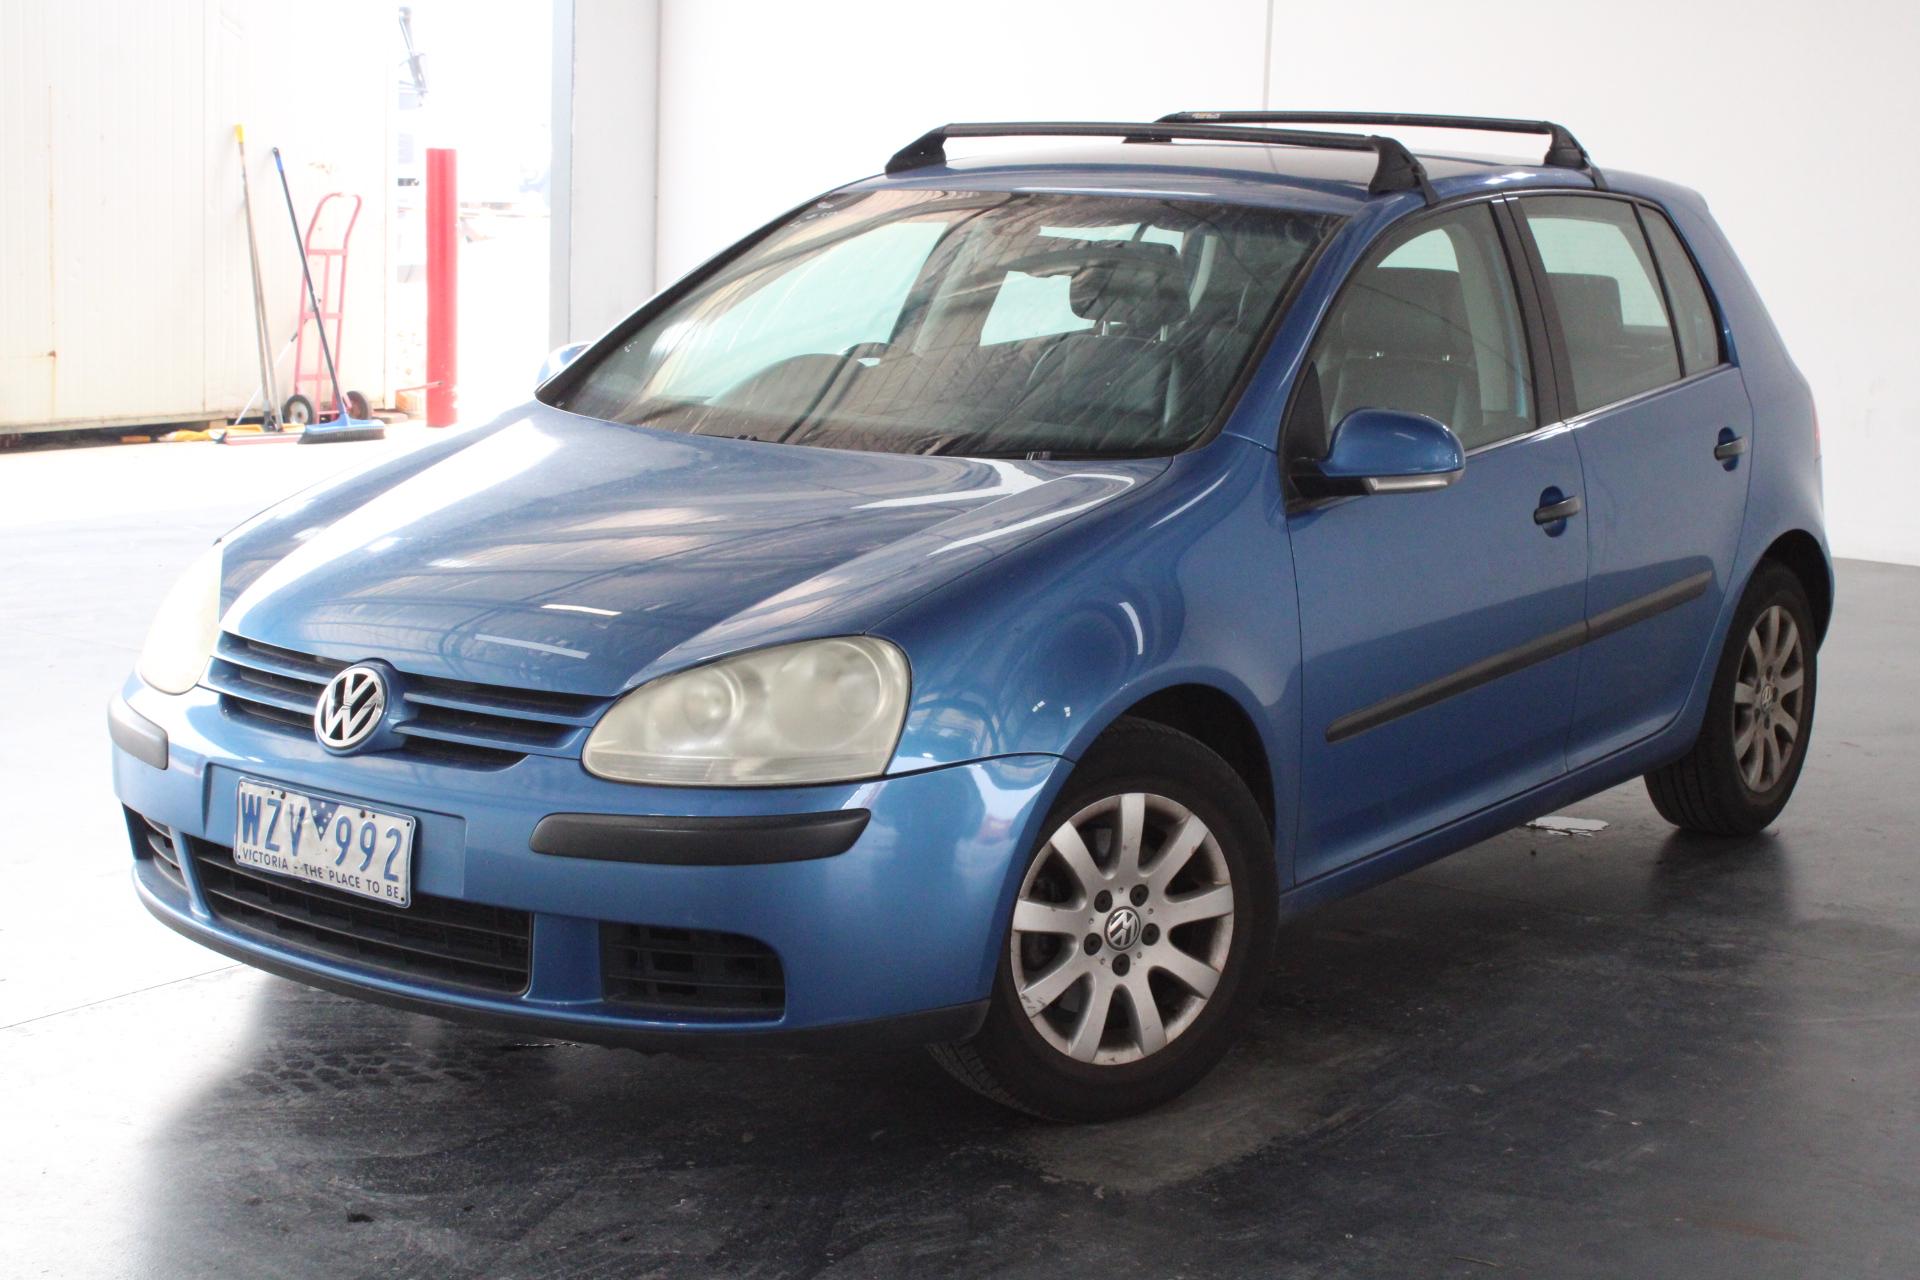 2005 Volkswagen Golf 2.0 TDI Comfortline 1k T/Diesel Automatic Hatchback